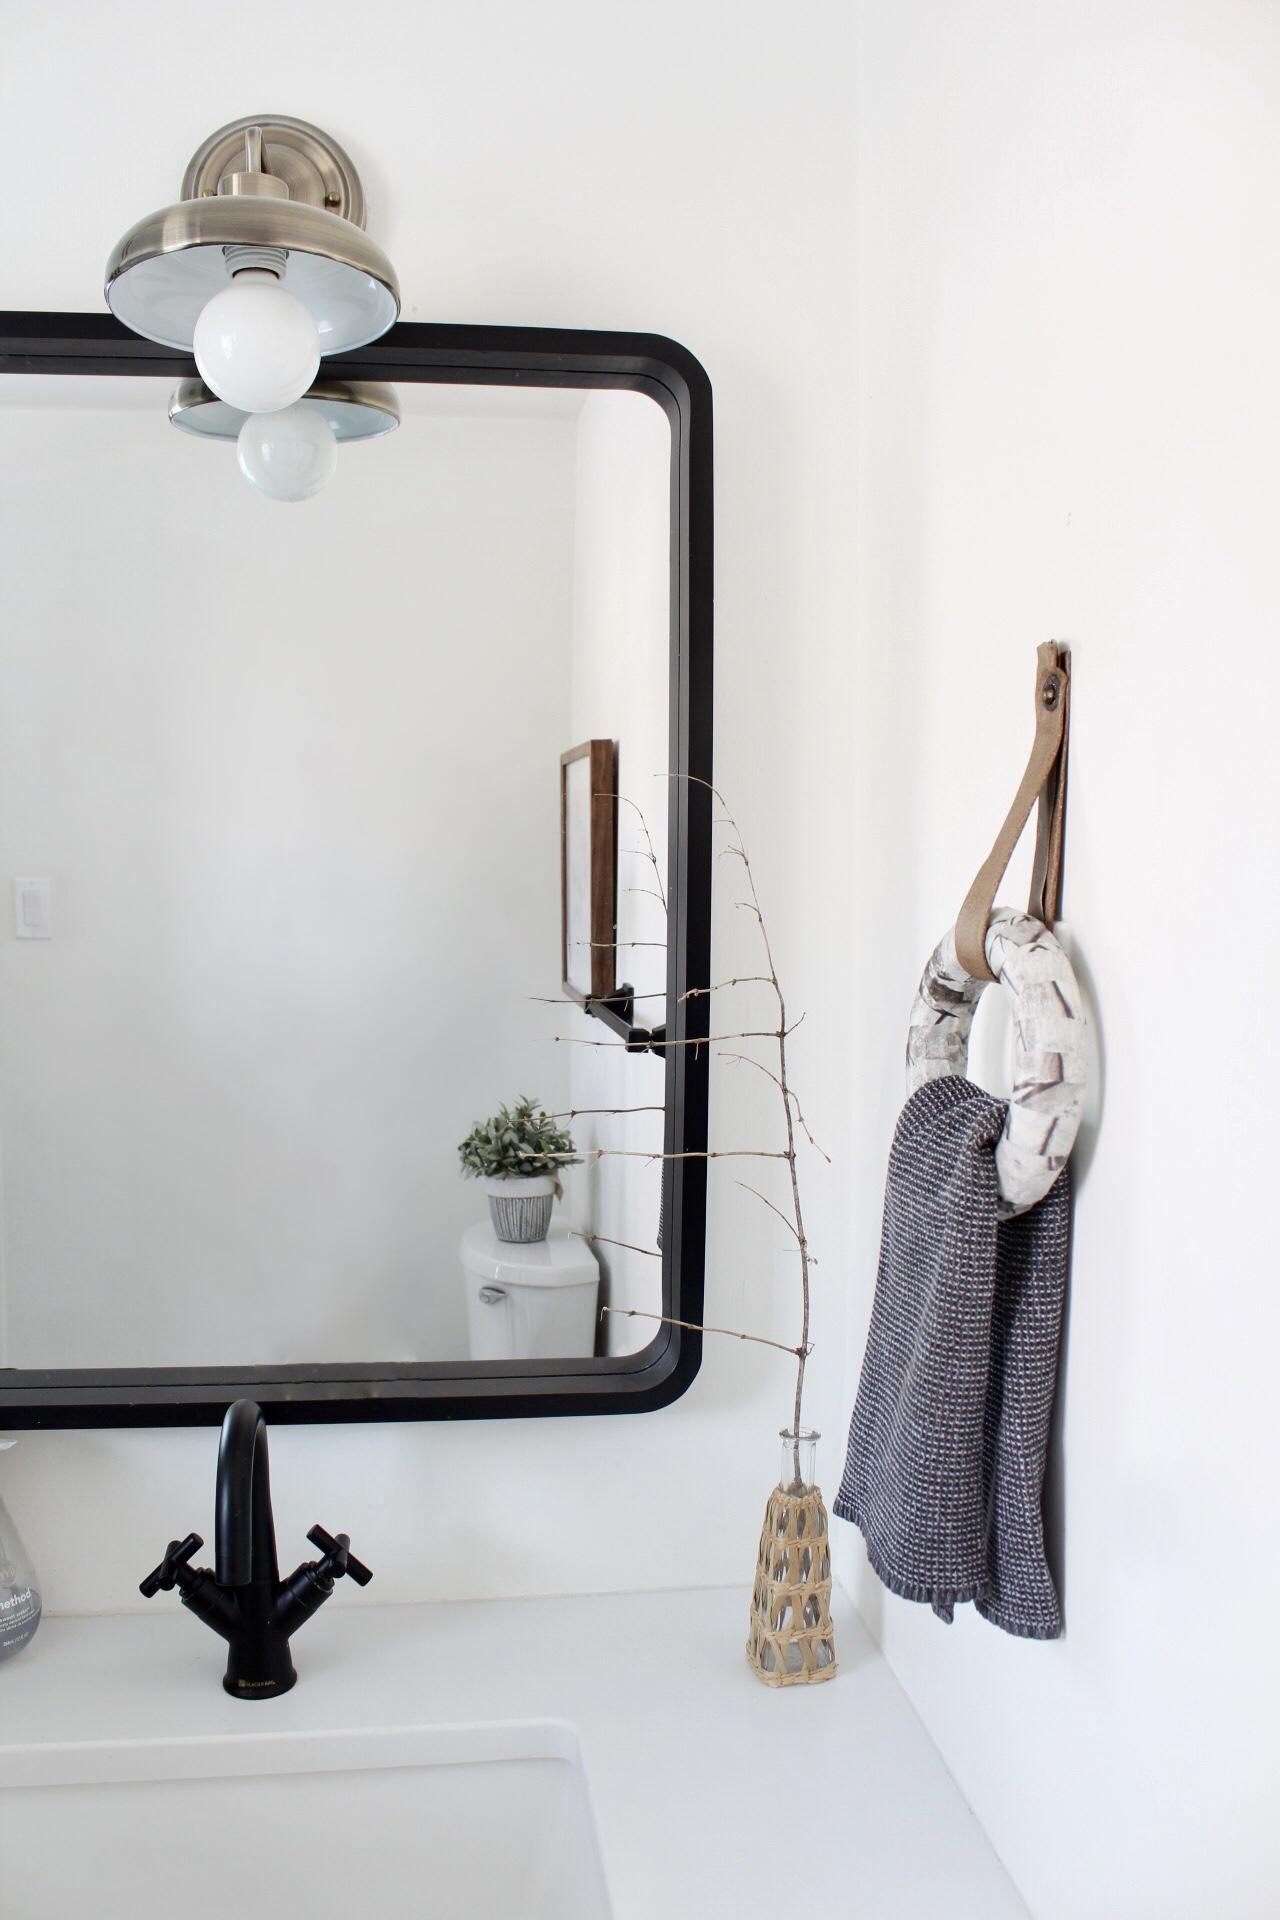 Bathroom Renovation with a DIY Towel Ring